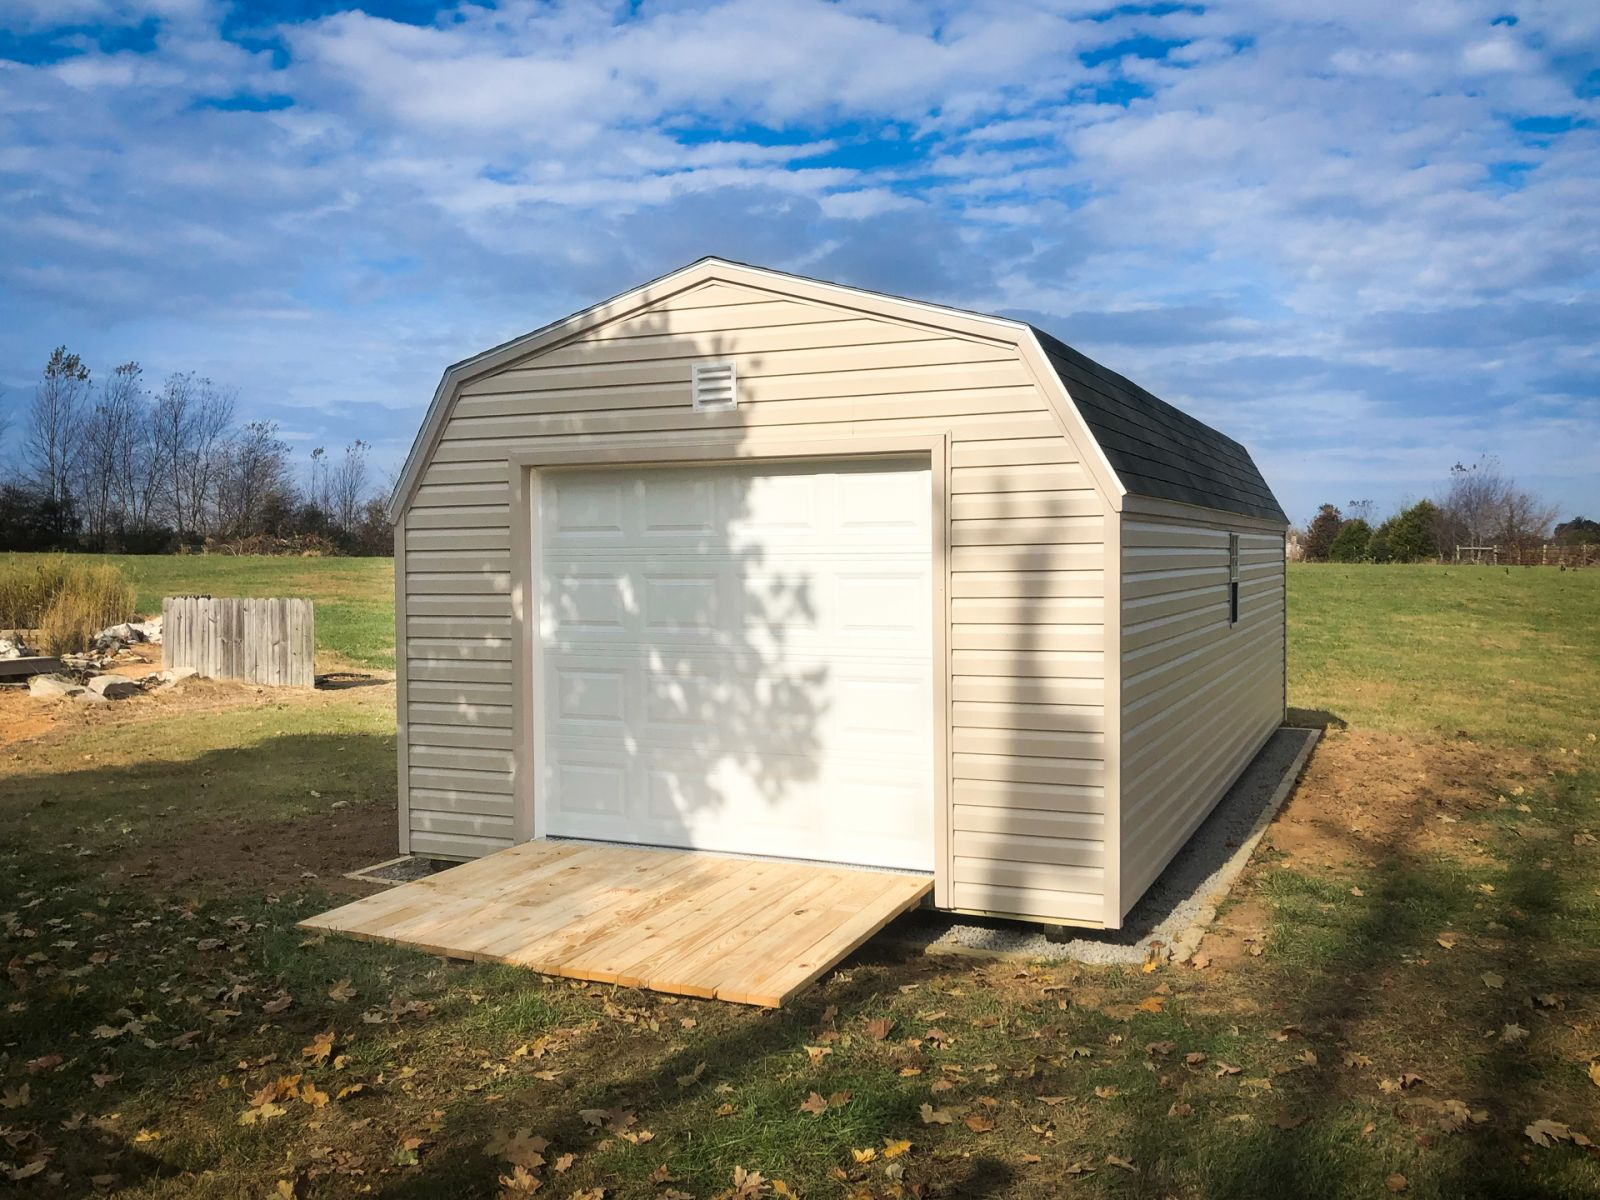 A garage shed near Albany, KY